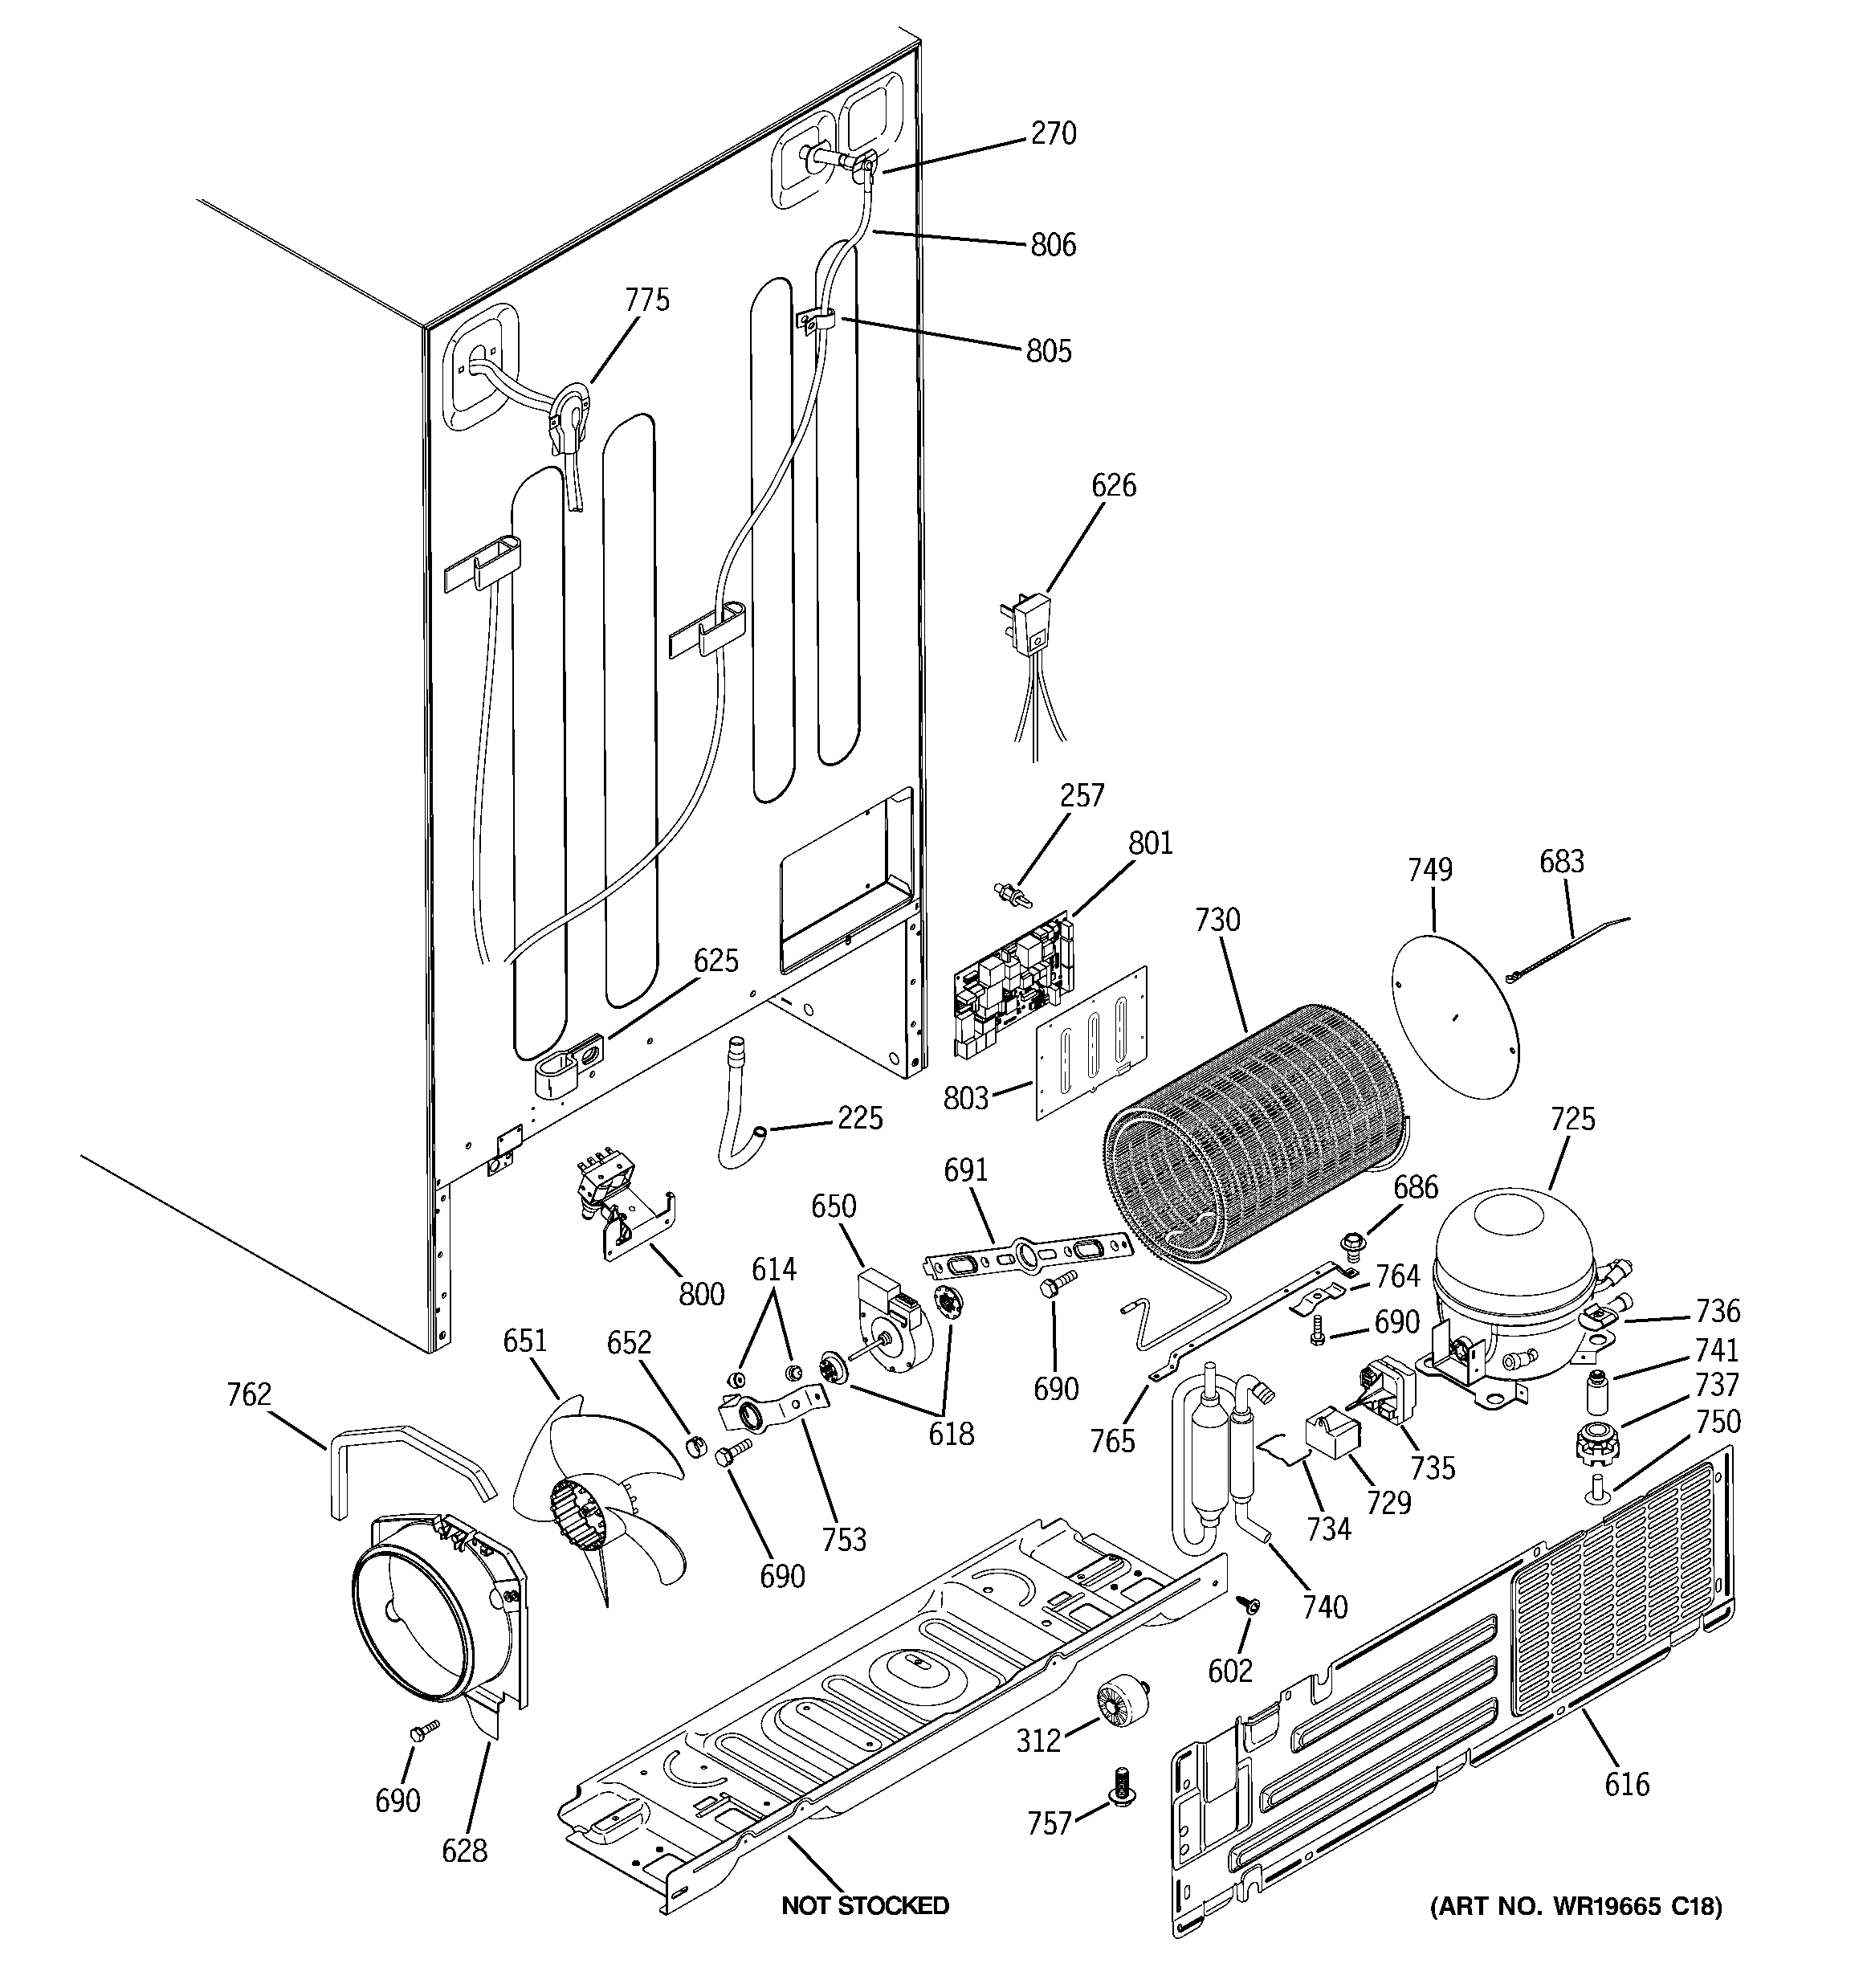 Gshf5kgxccww Ge Wiring Schematic Electrical Diagrams Roketa Maui 50 Diagram Model Side By Refrigerator Genuine Parts